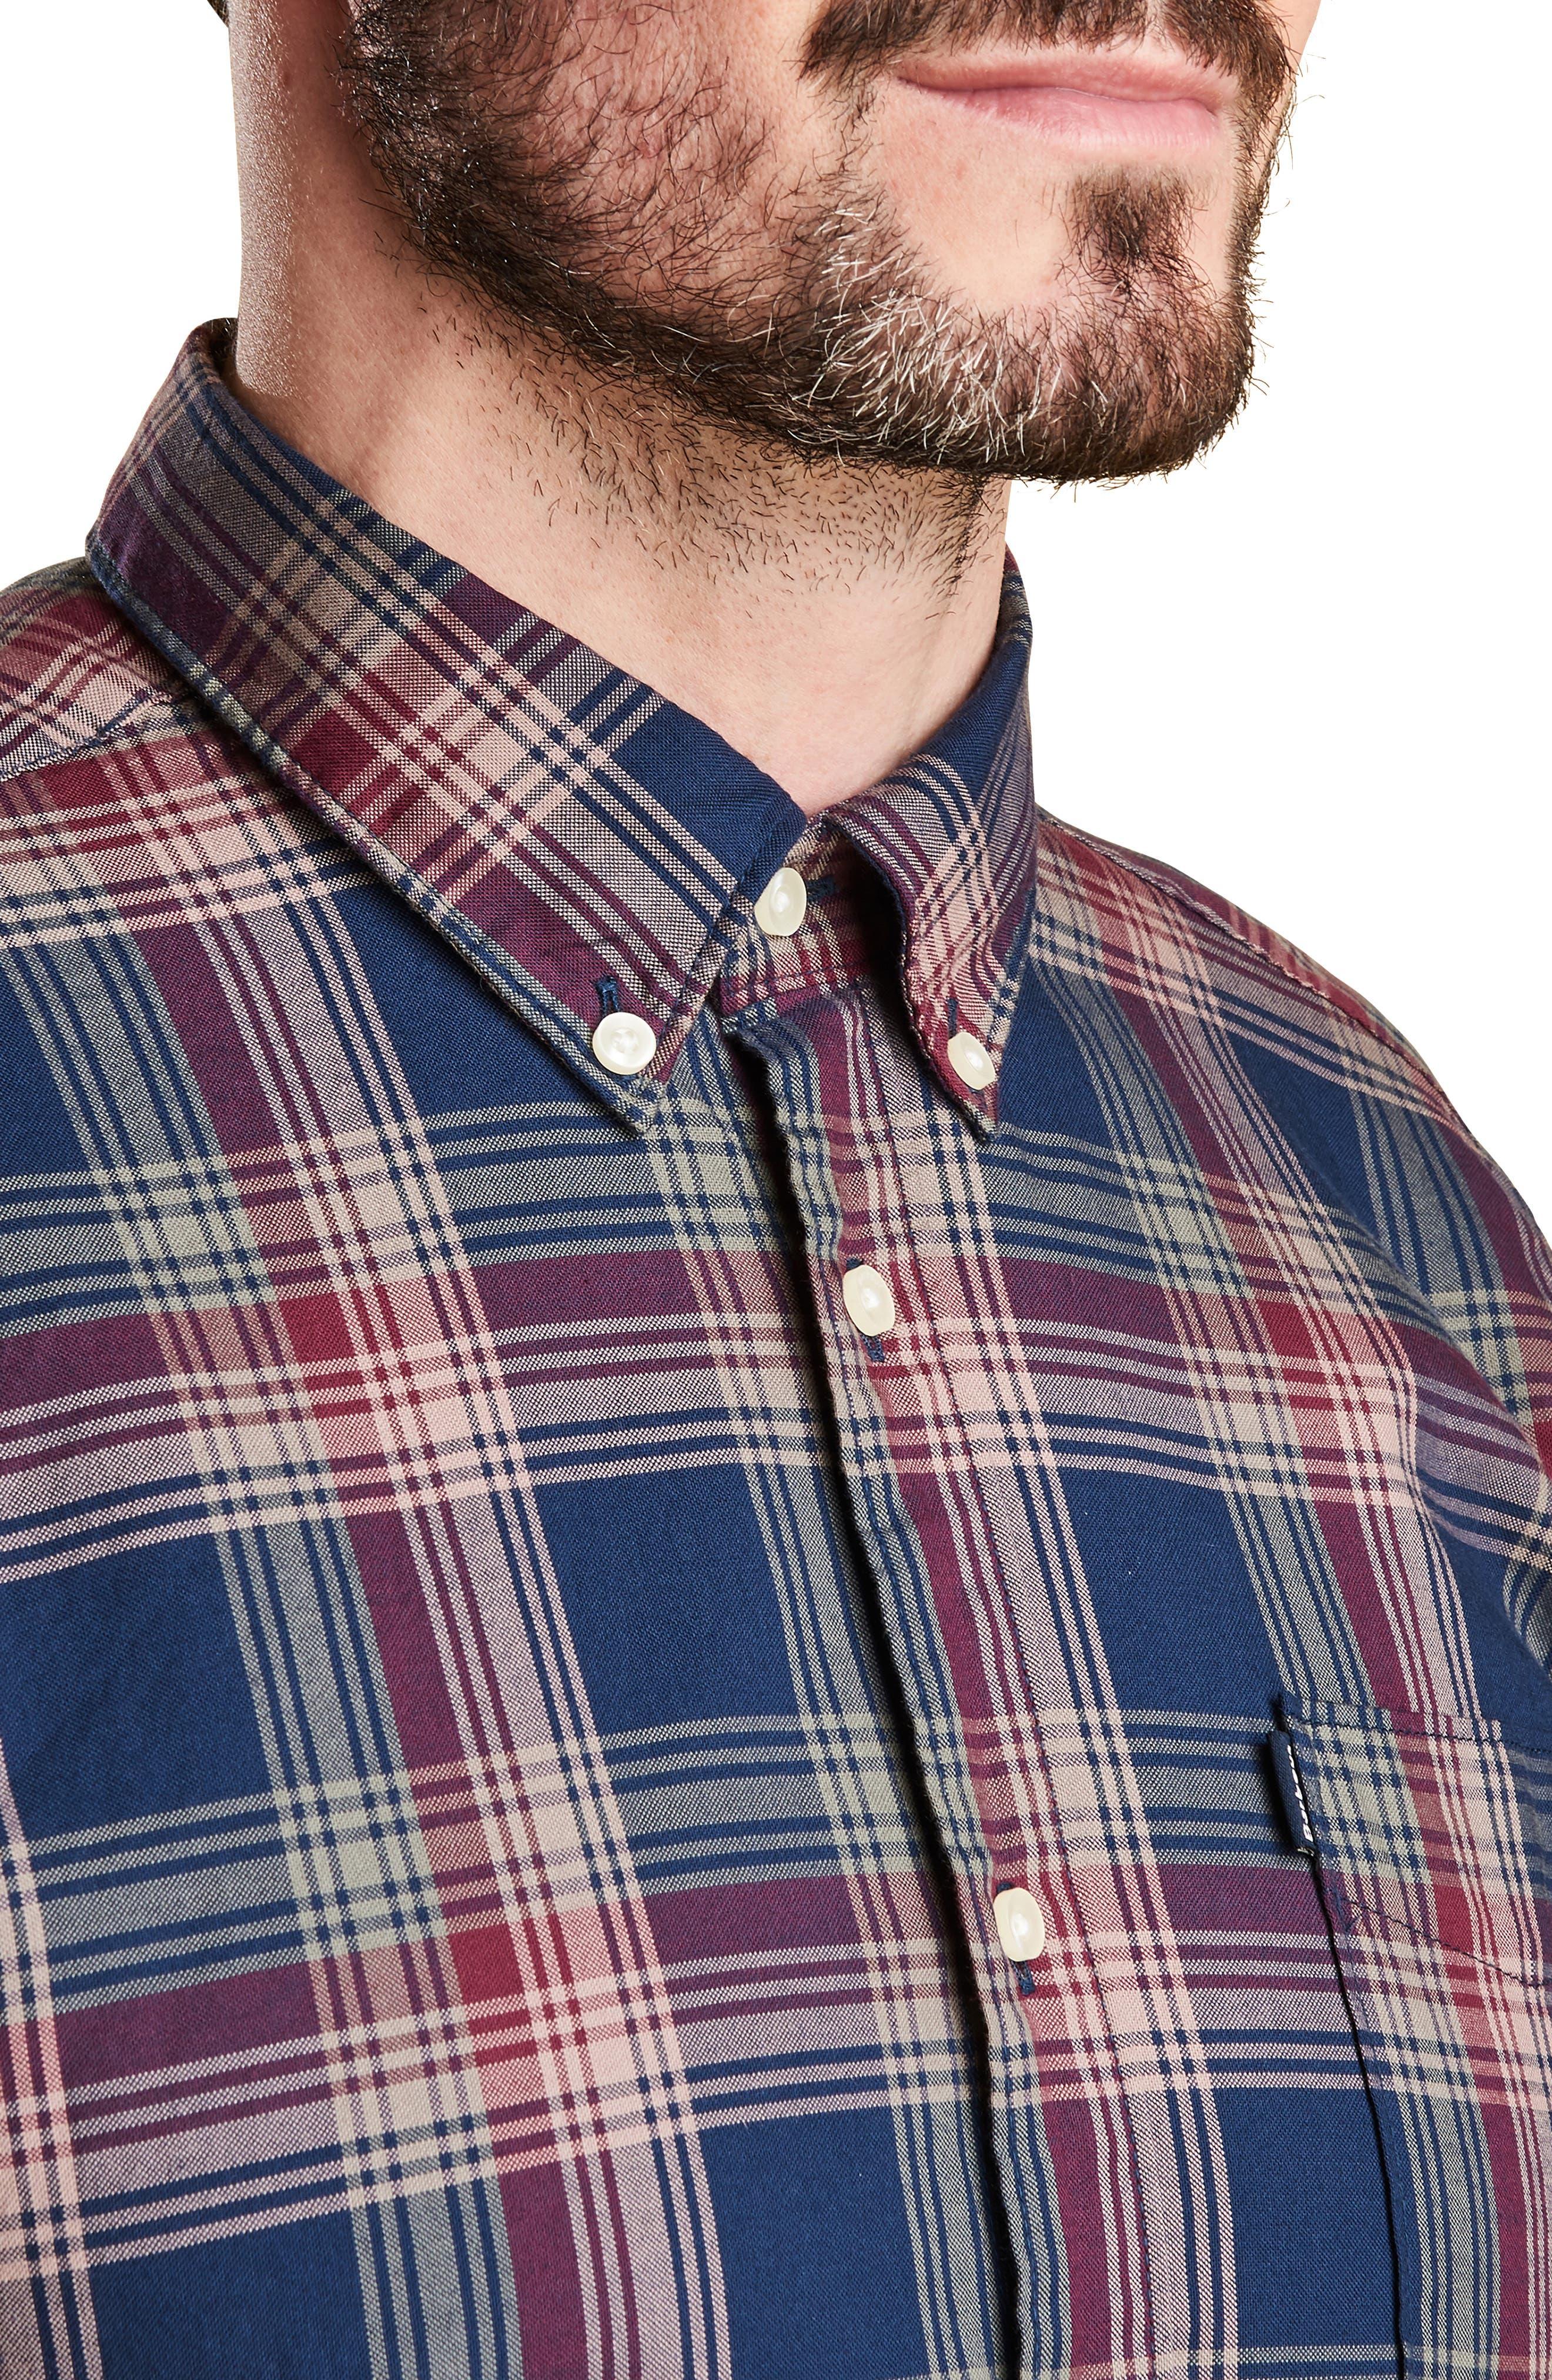 Endsleigh Highland Check Woven Shirt,                             Alternate thumbnail 2, color,                             NAVY